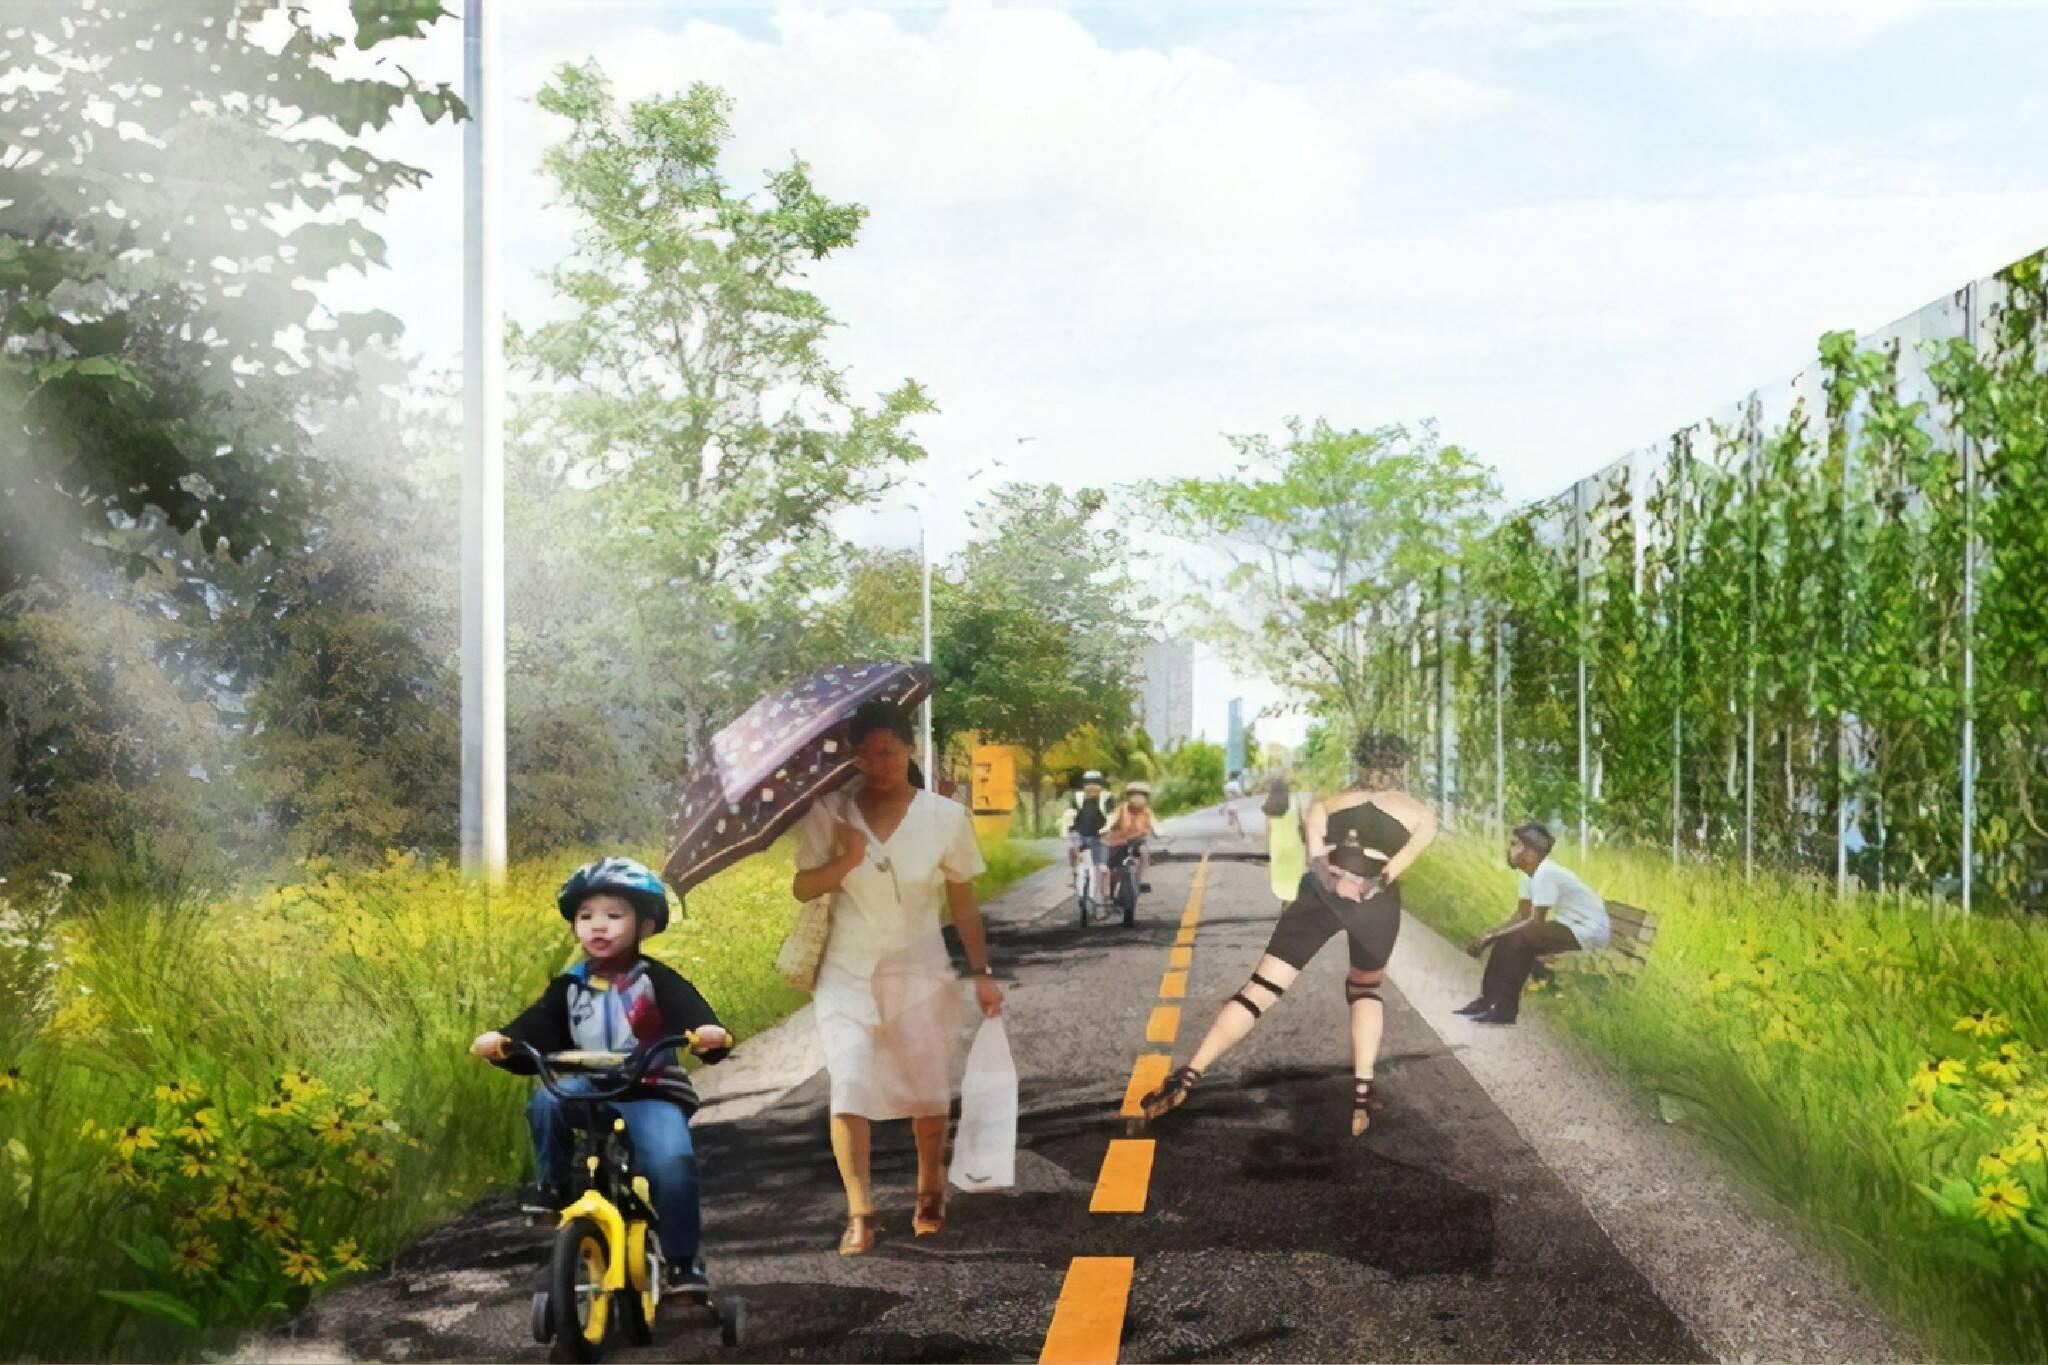 west toronto railpath extension